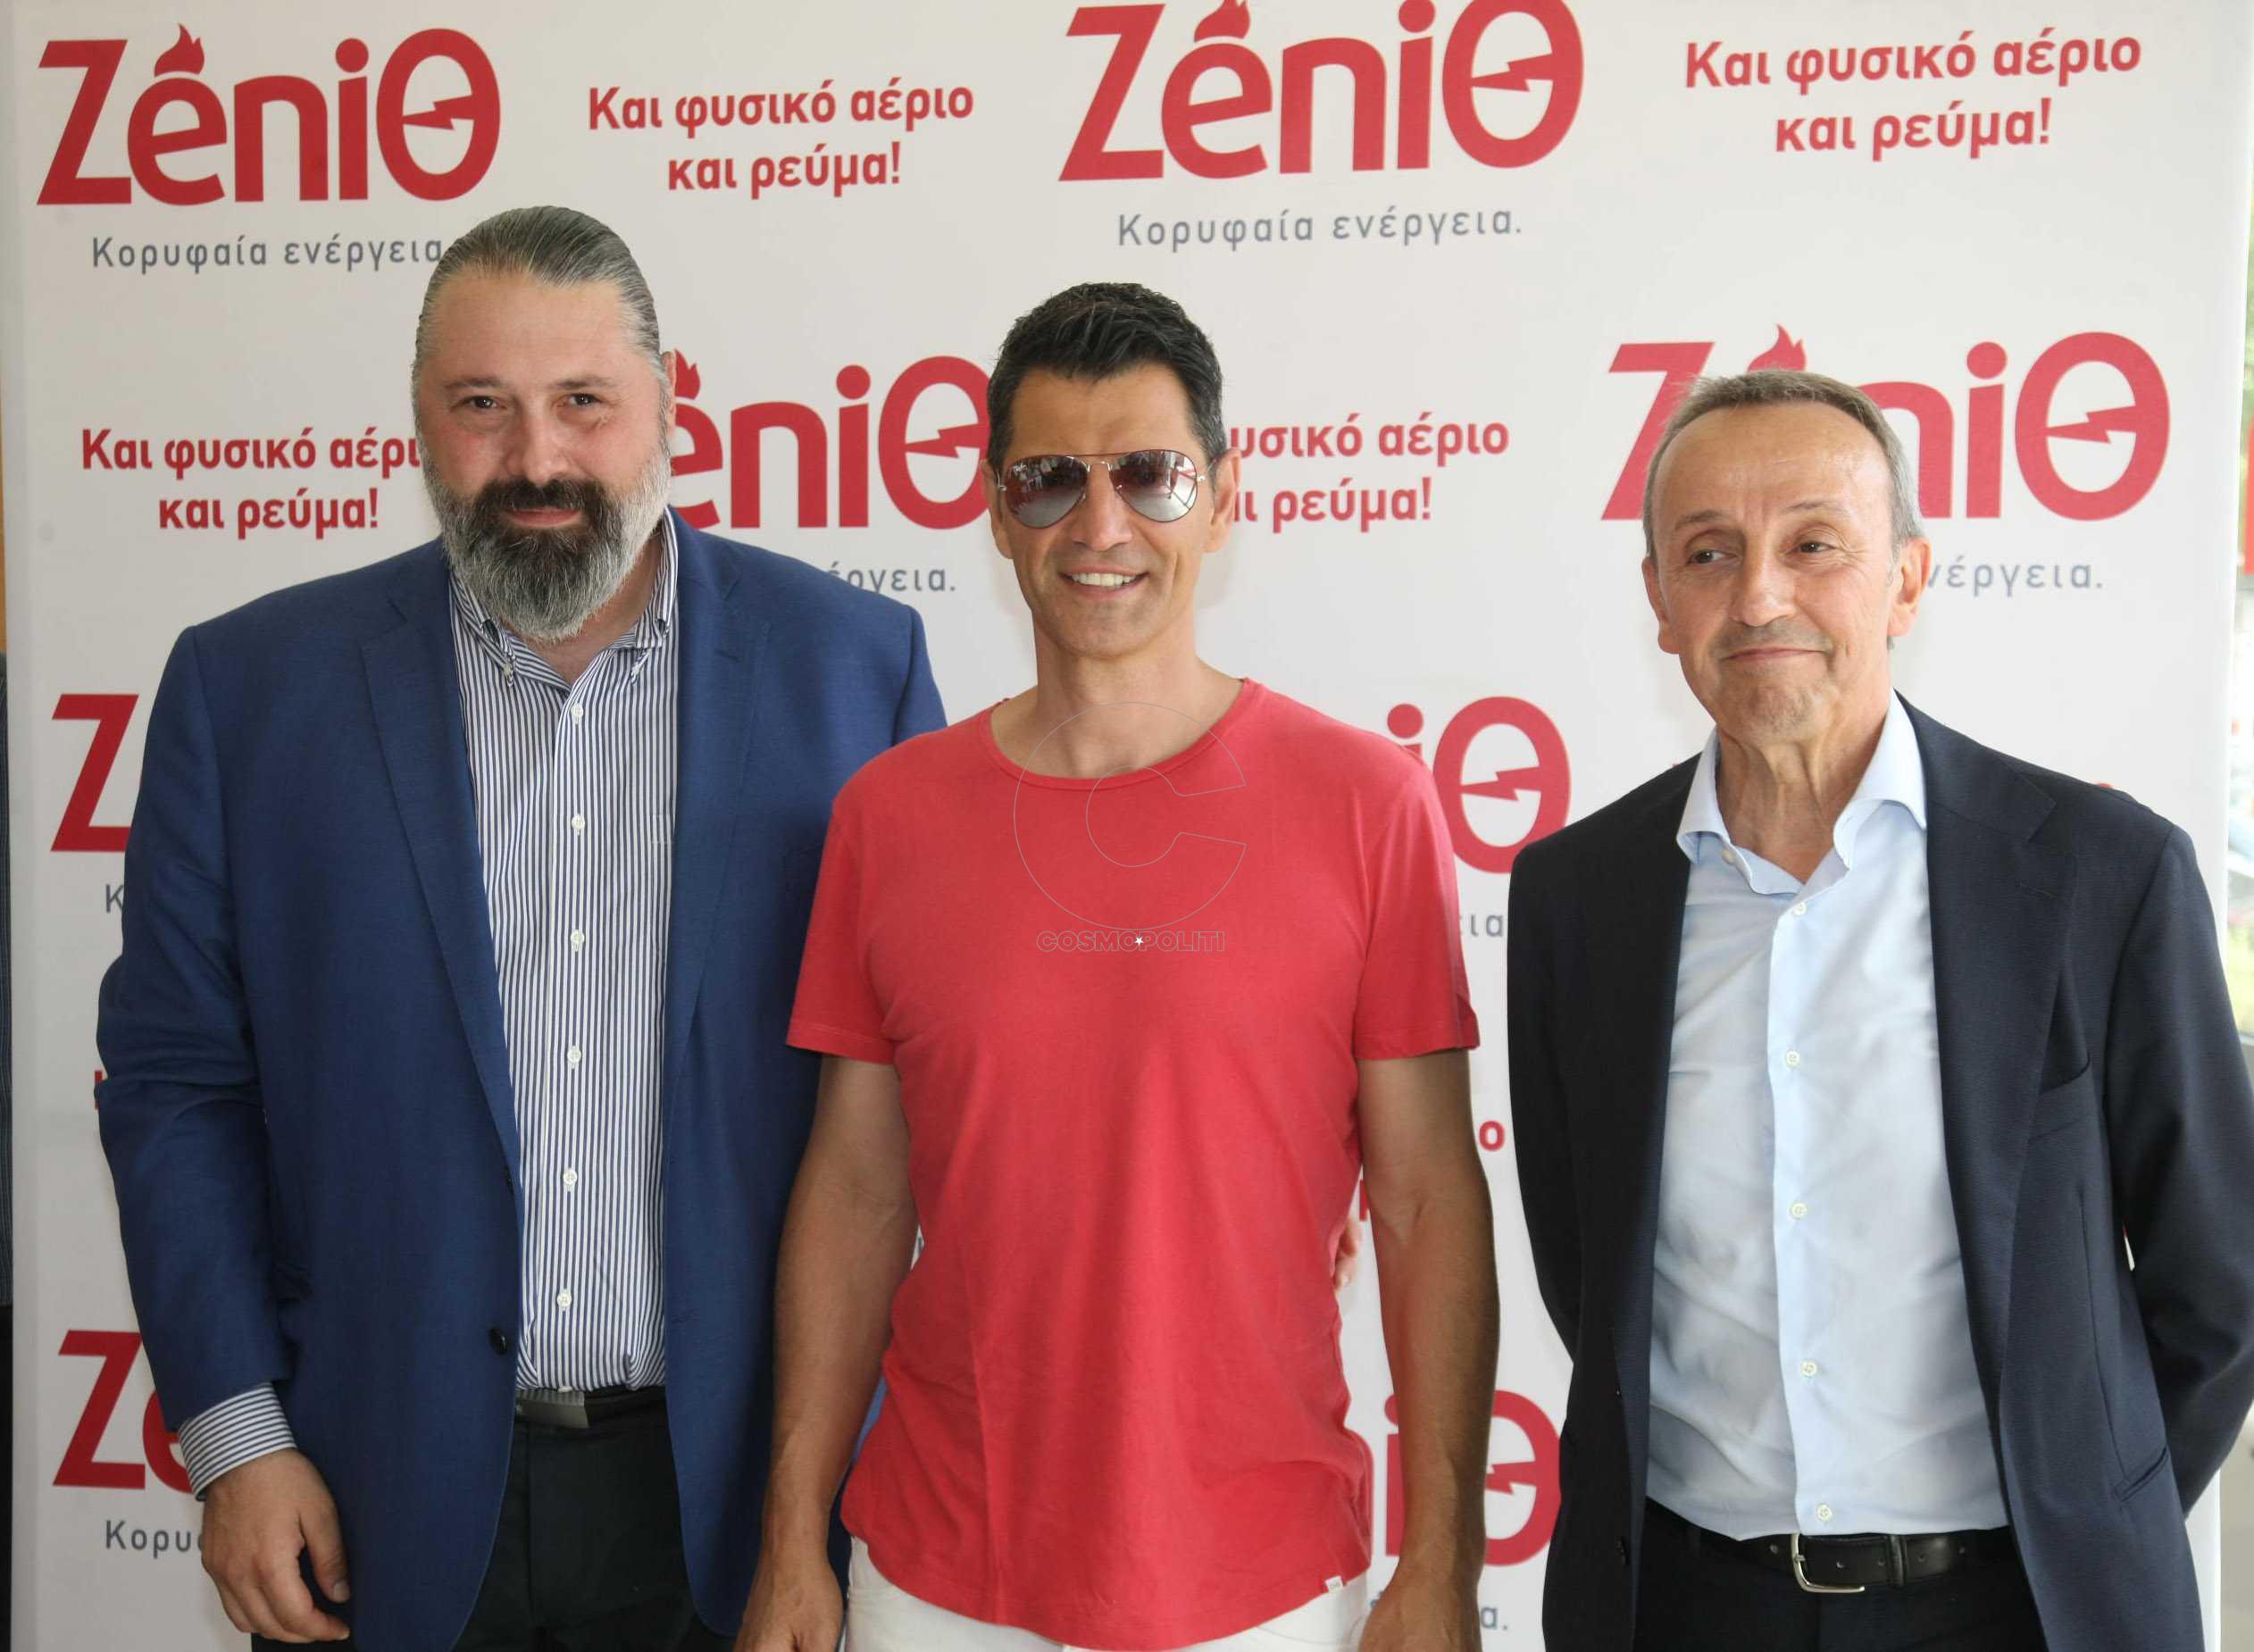 sakis_rouvas_zenith_store_thessaloniki_1_2